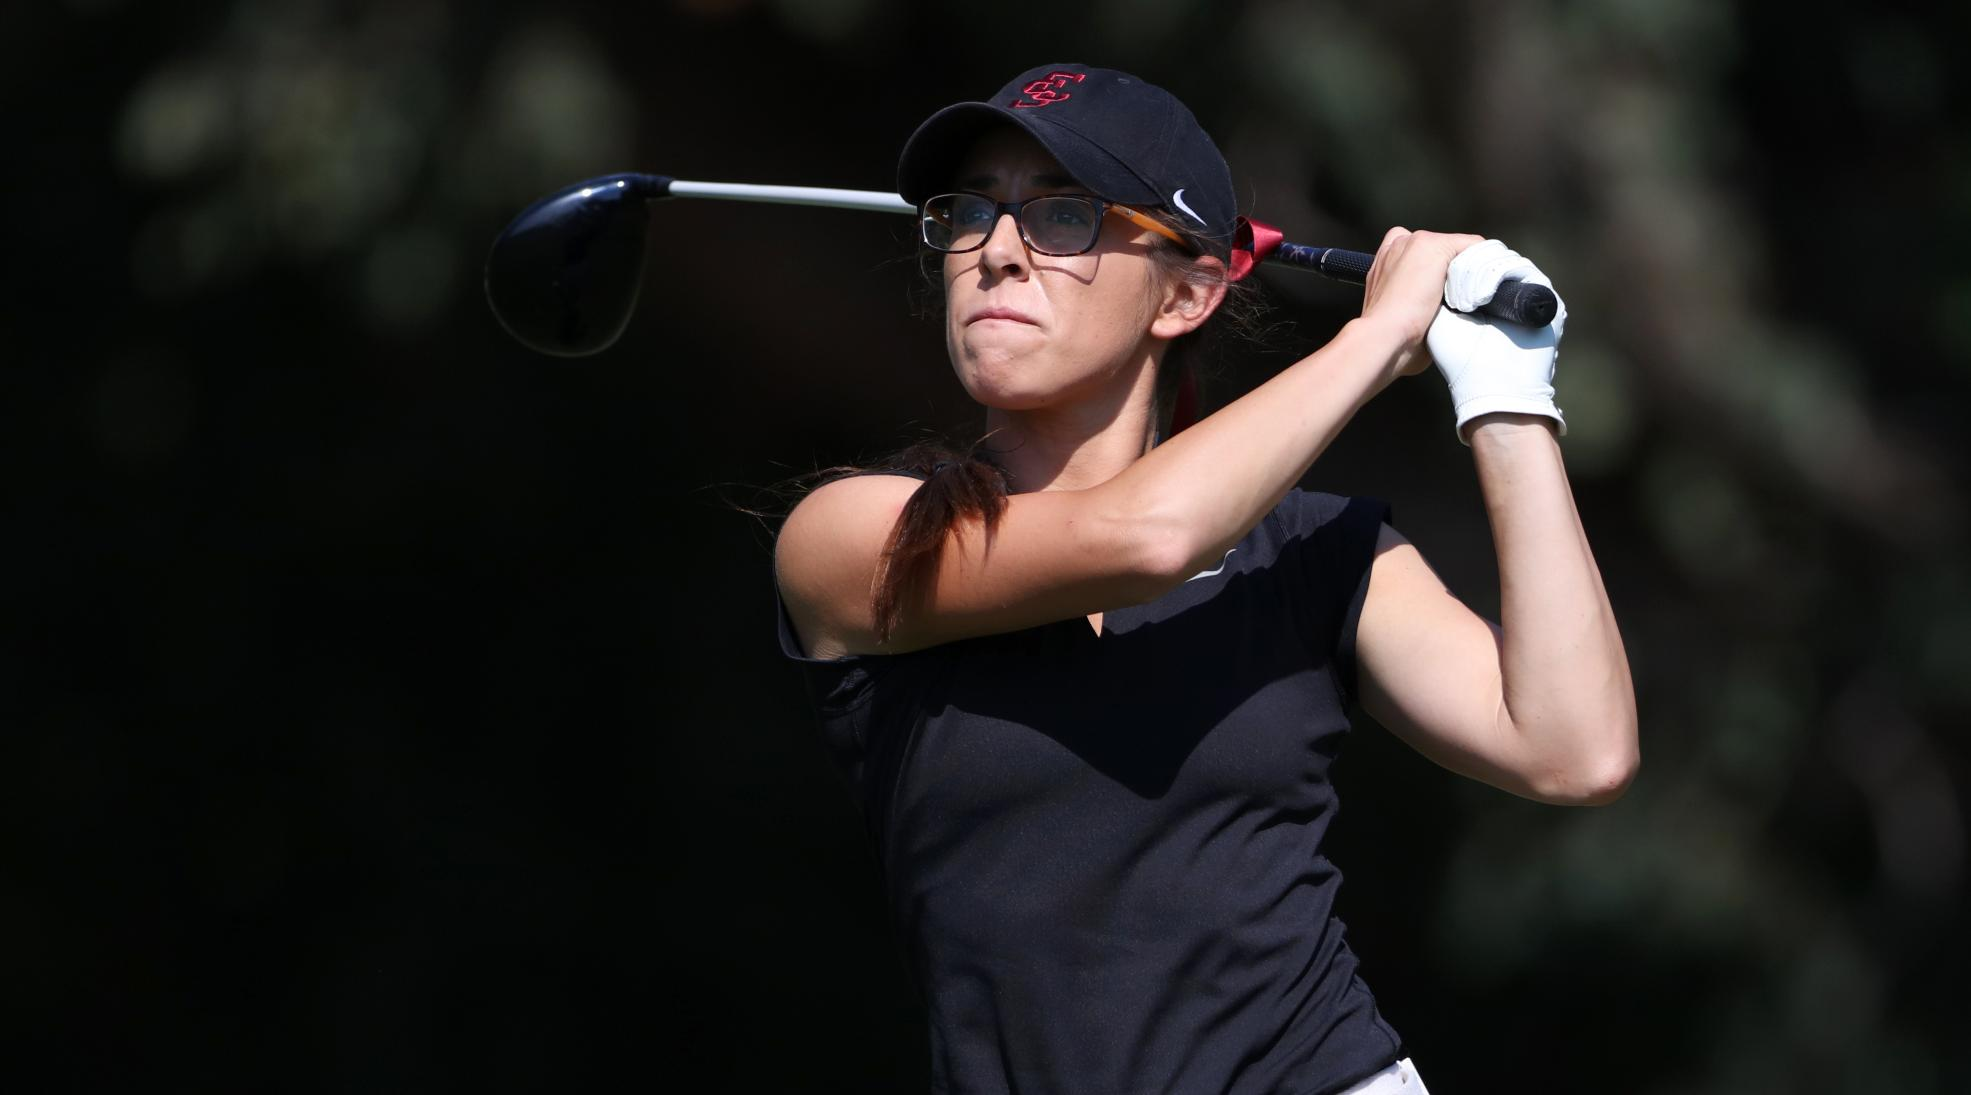 women s golf at san jose state juli inkster spartan invitational